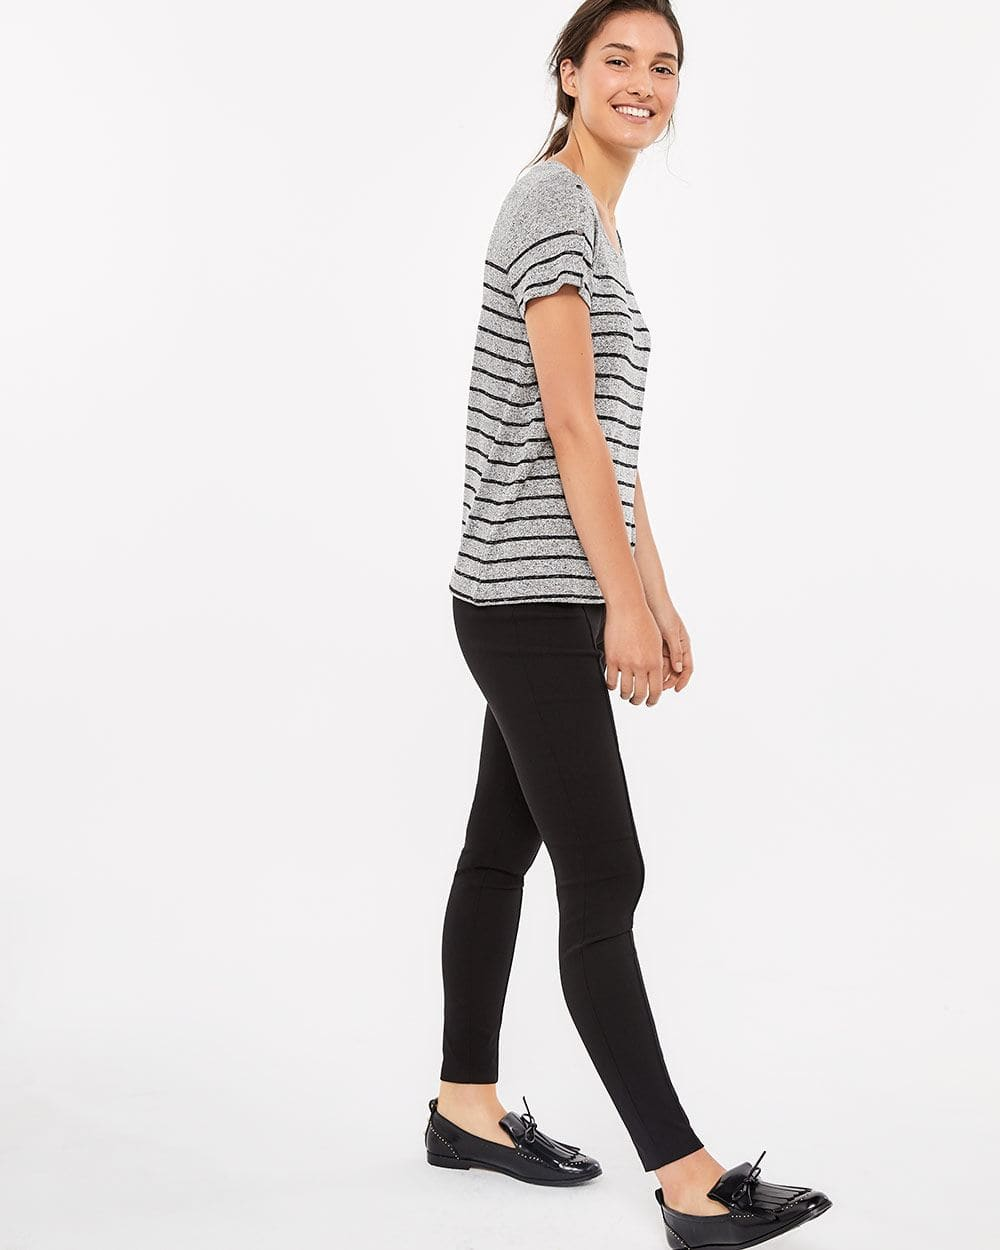 Legging L'Iconique Long